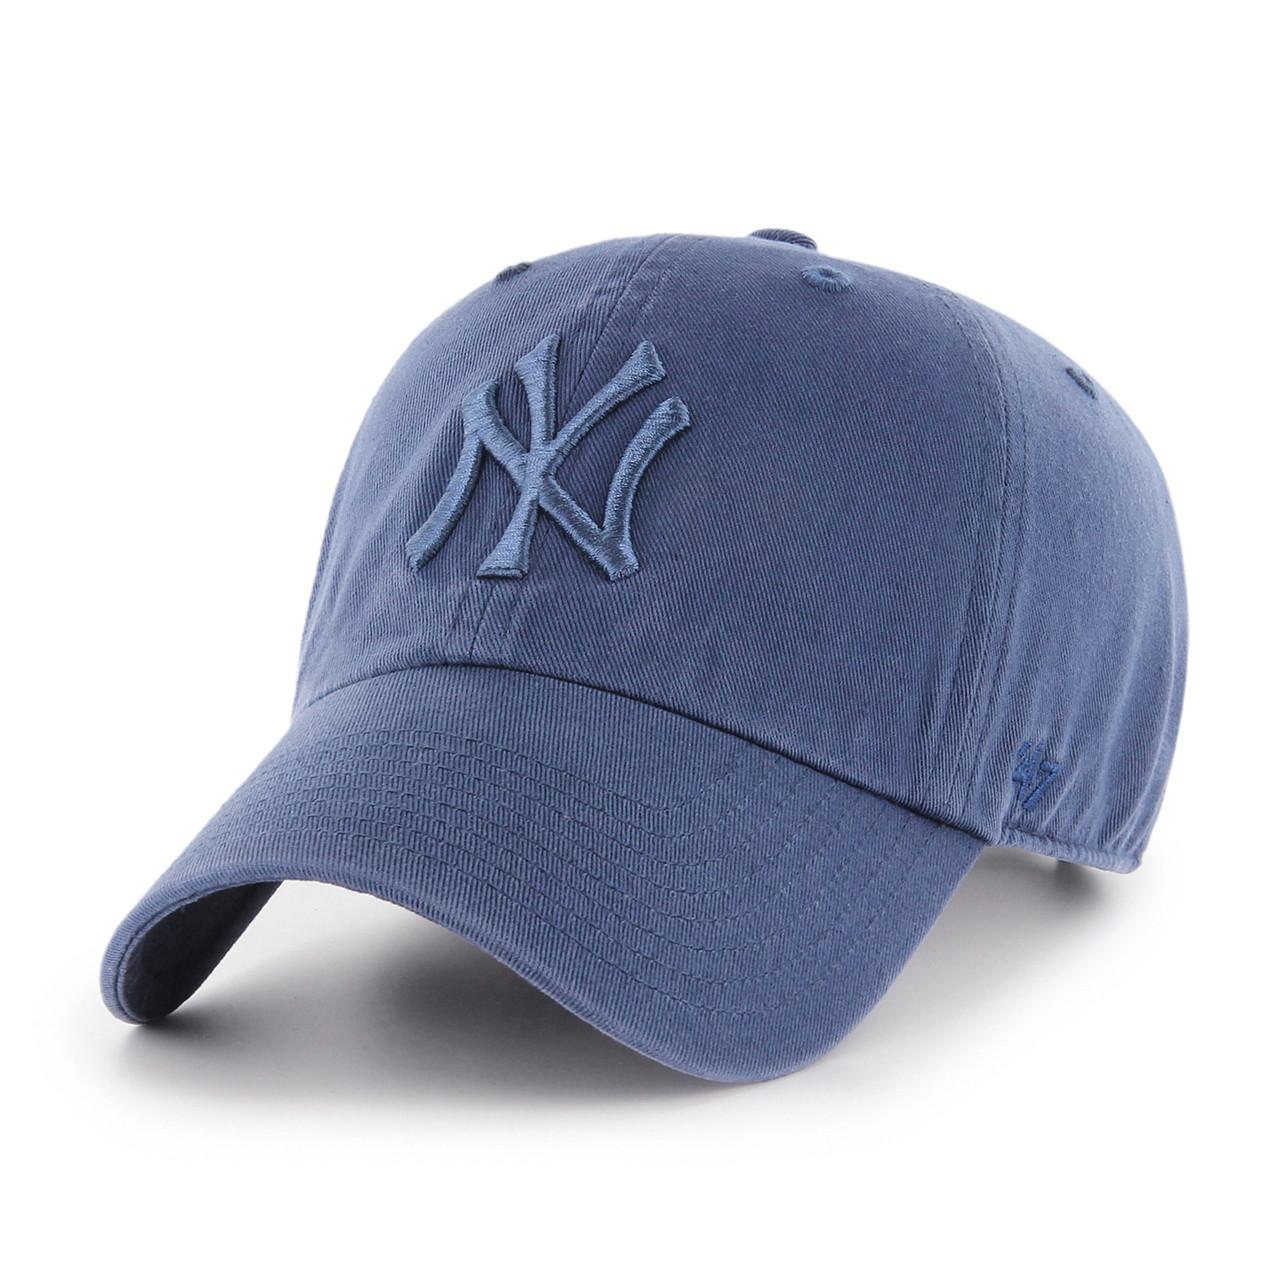 0ee3b05b NY Yankees Timber Blue 47Brand MLB Strapback Clean Up Hat. 47Brand